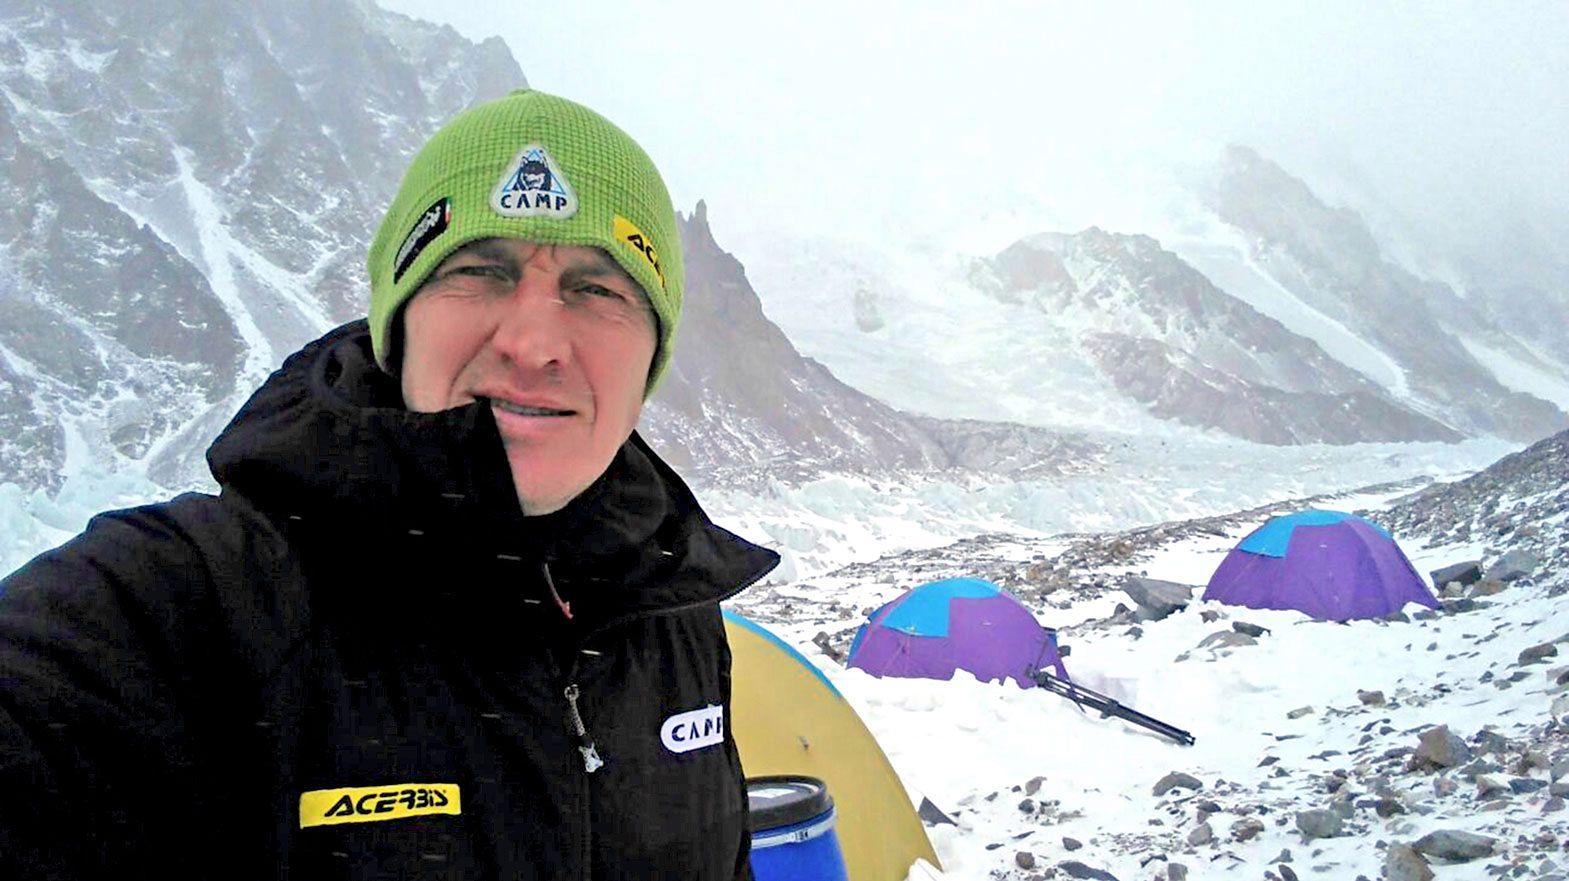 Himalaista zdradza tajemnice gór